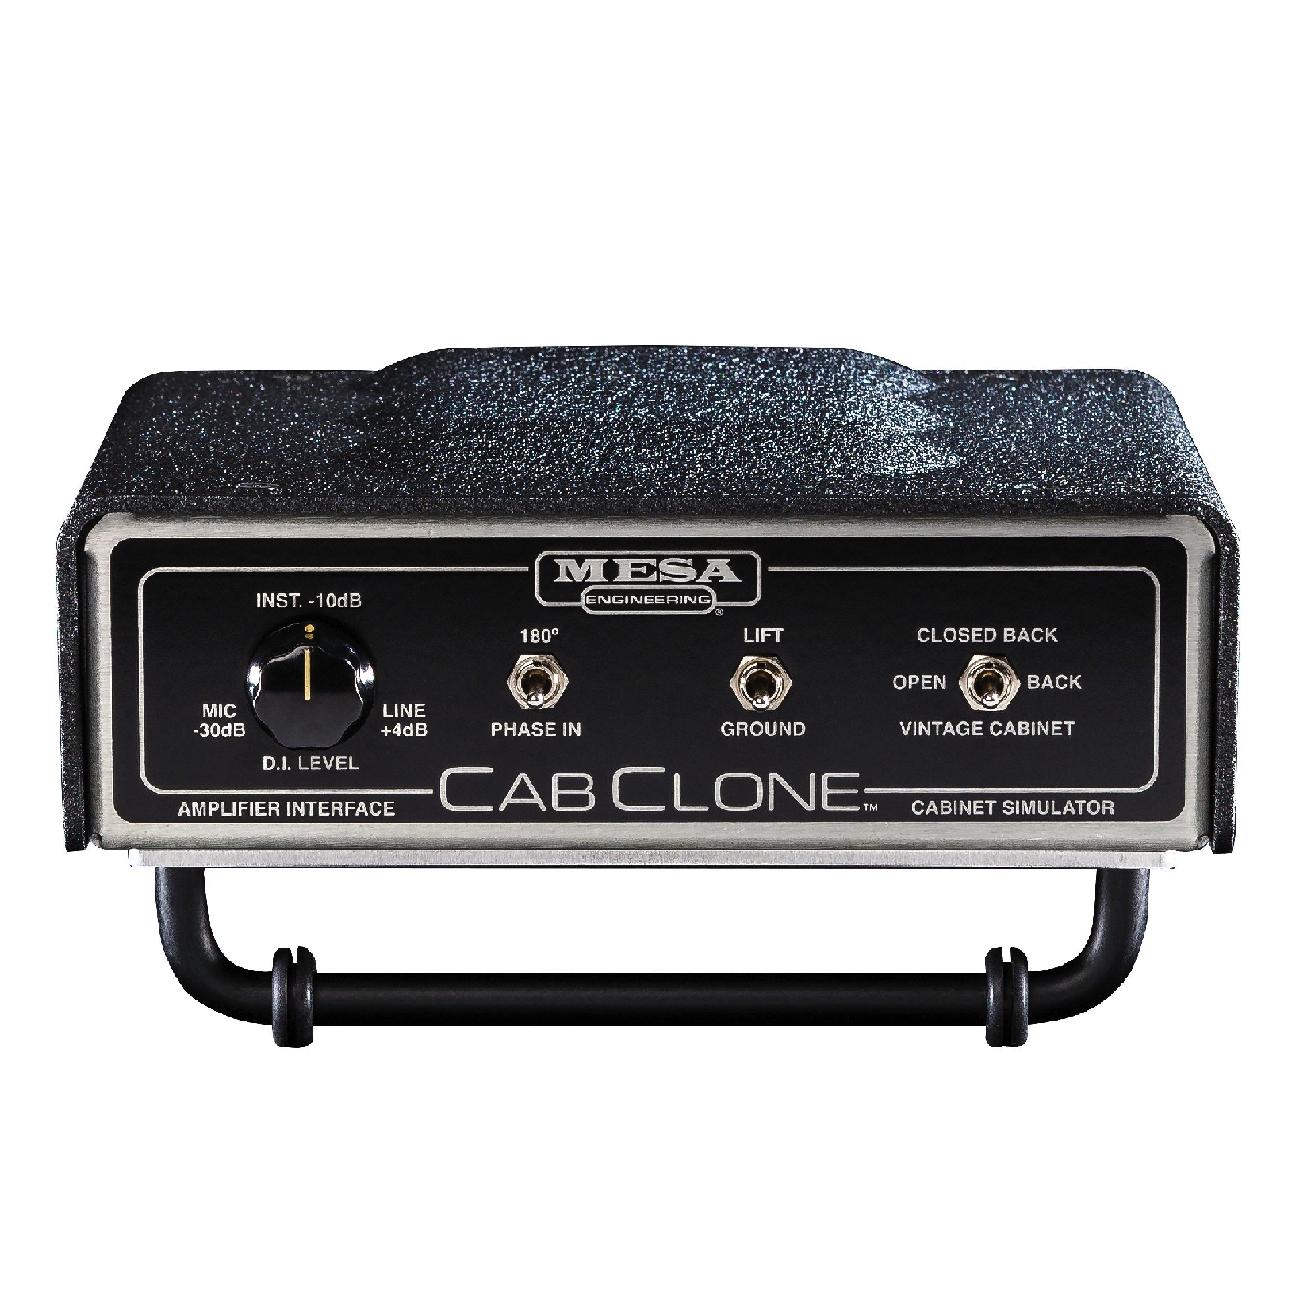 Симулятор гитарного кабинета Mesa Boogie CABCLONE - 16 OHM